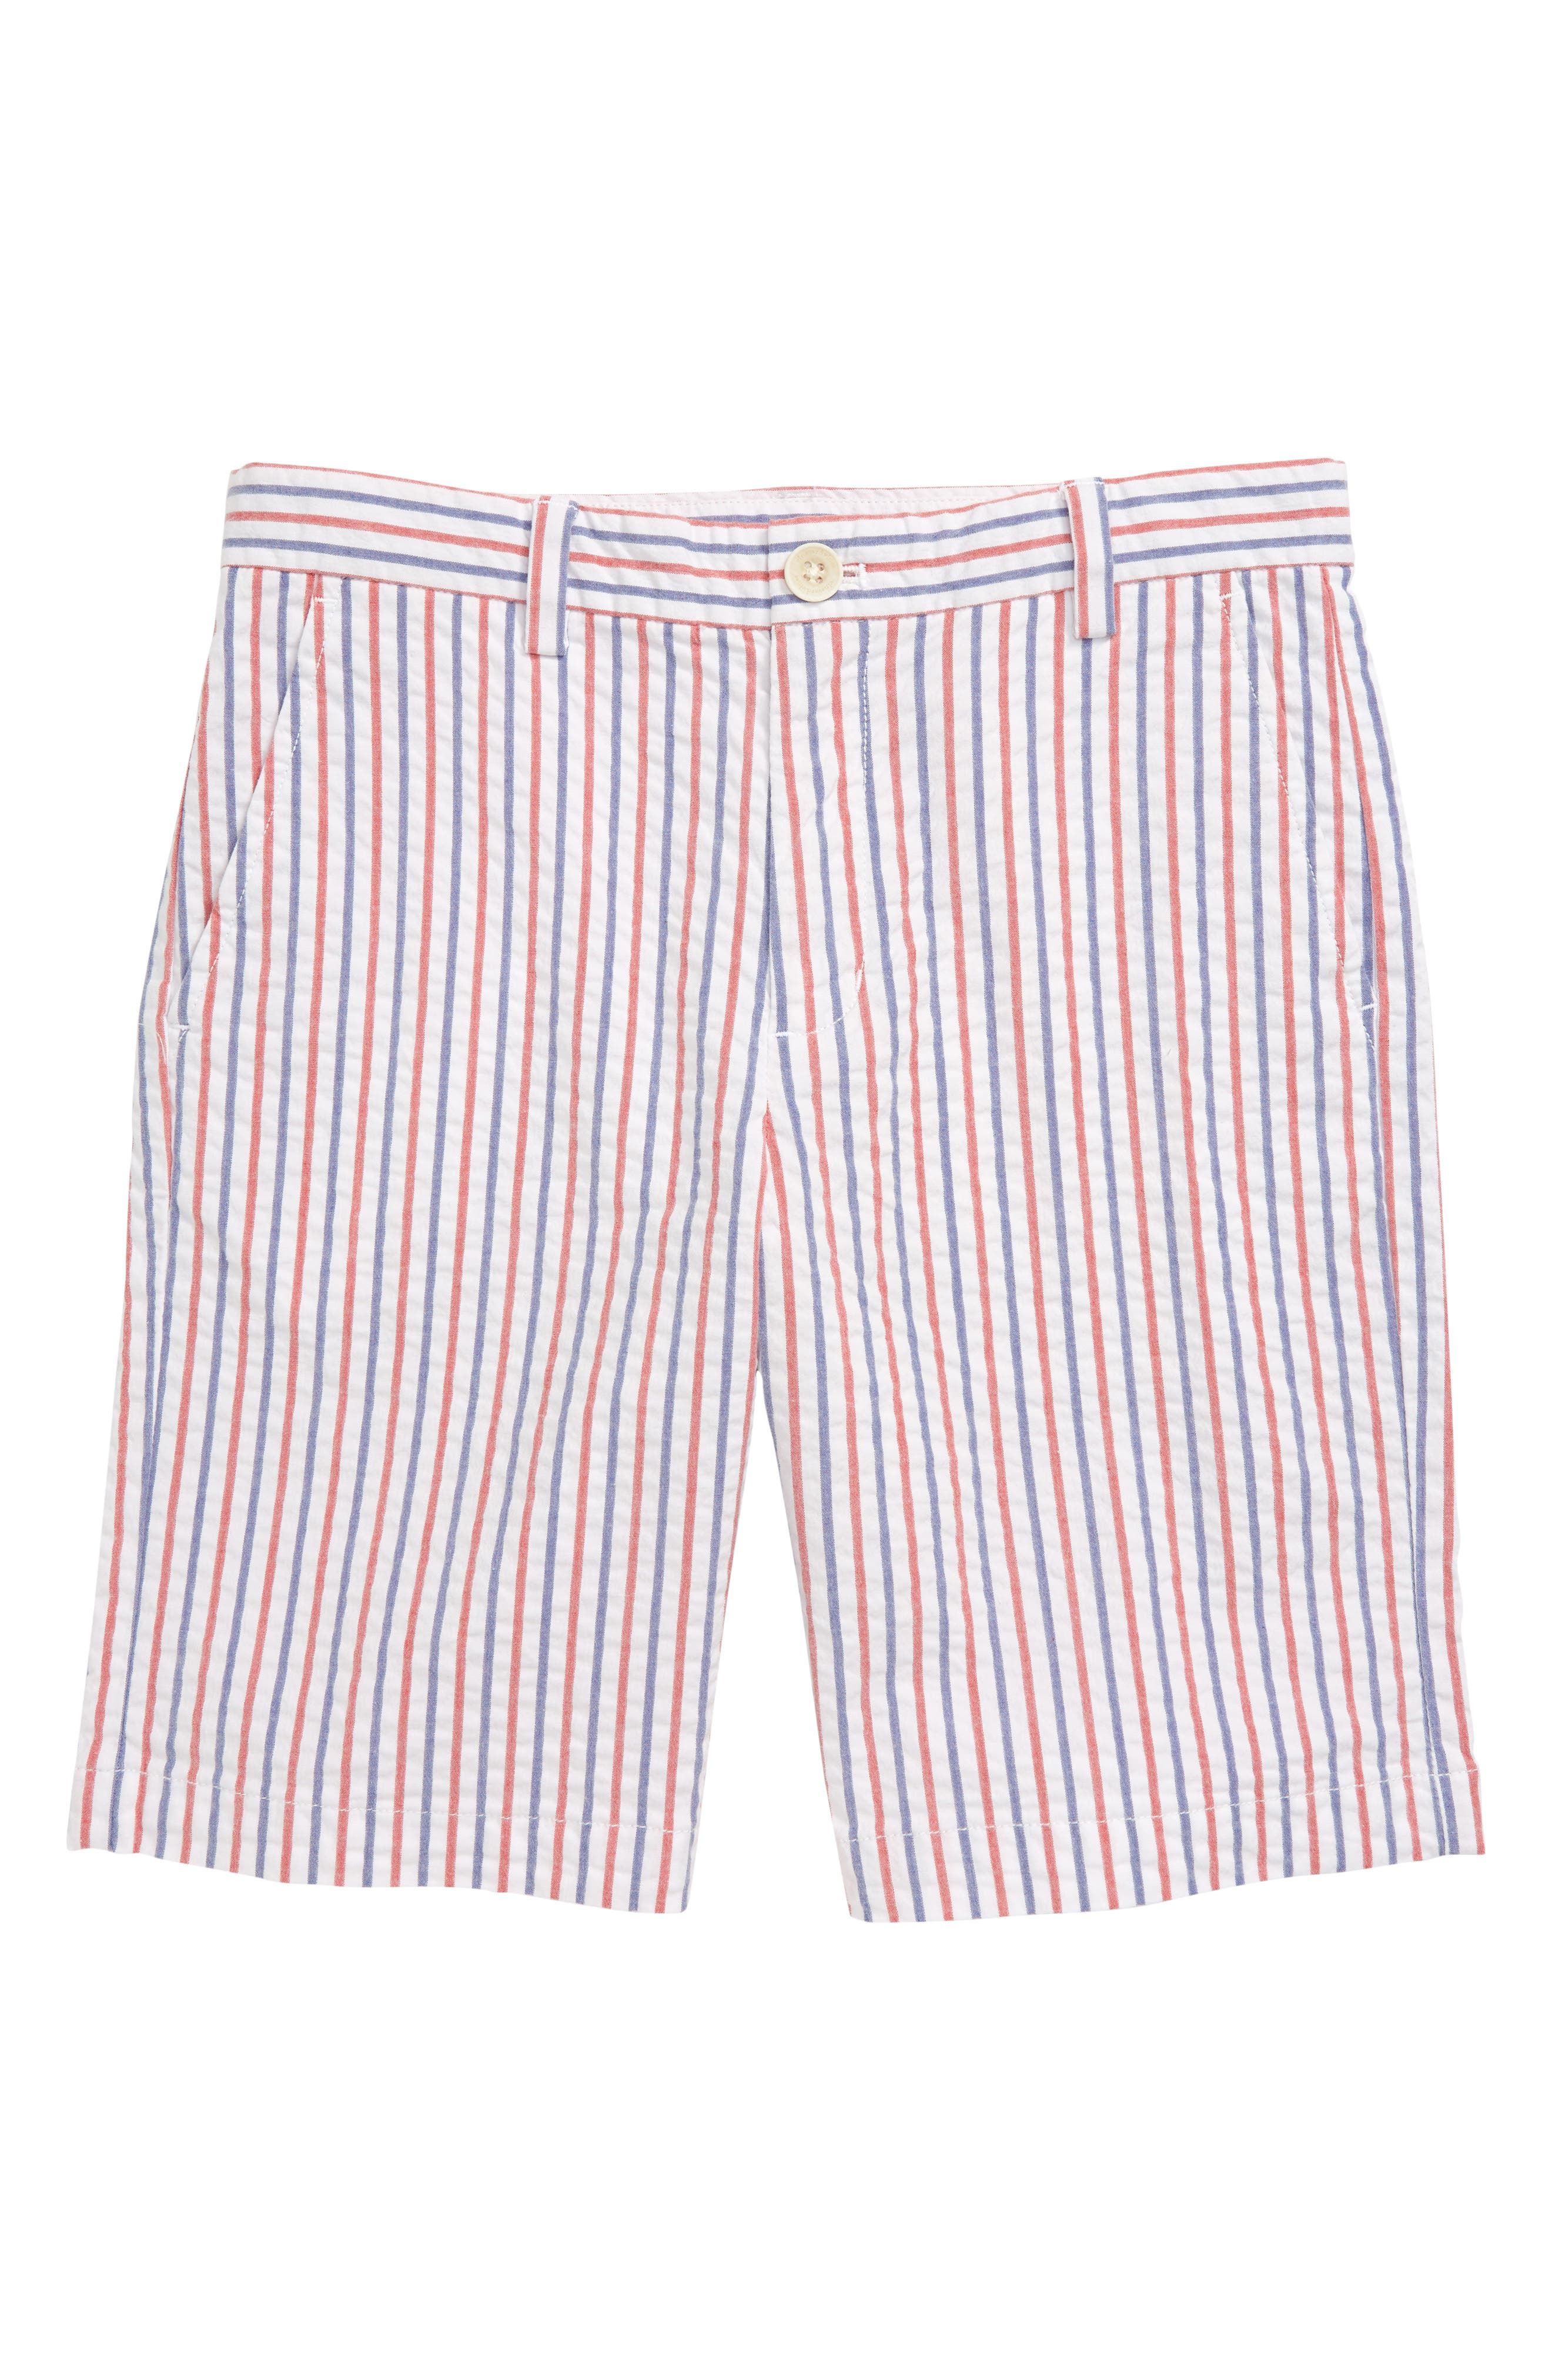 Boys Vineyard Vines Firework Stripe Seersucker Breaker Shorts